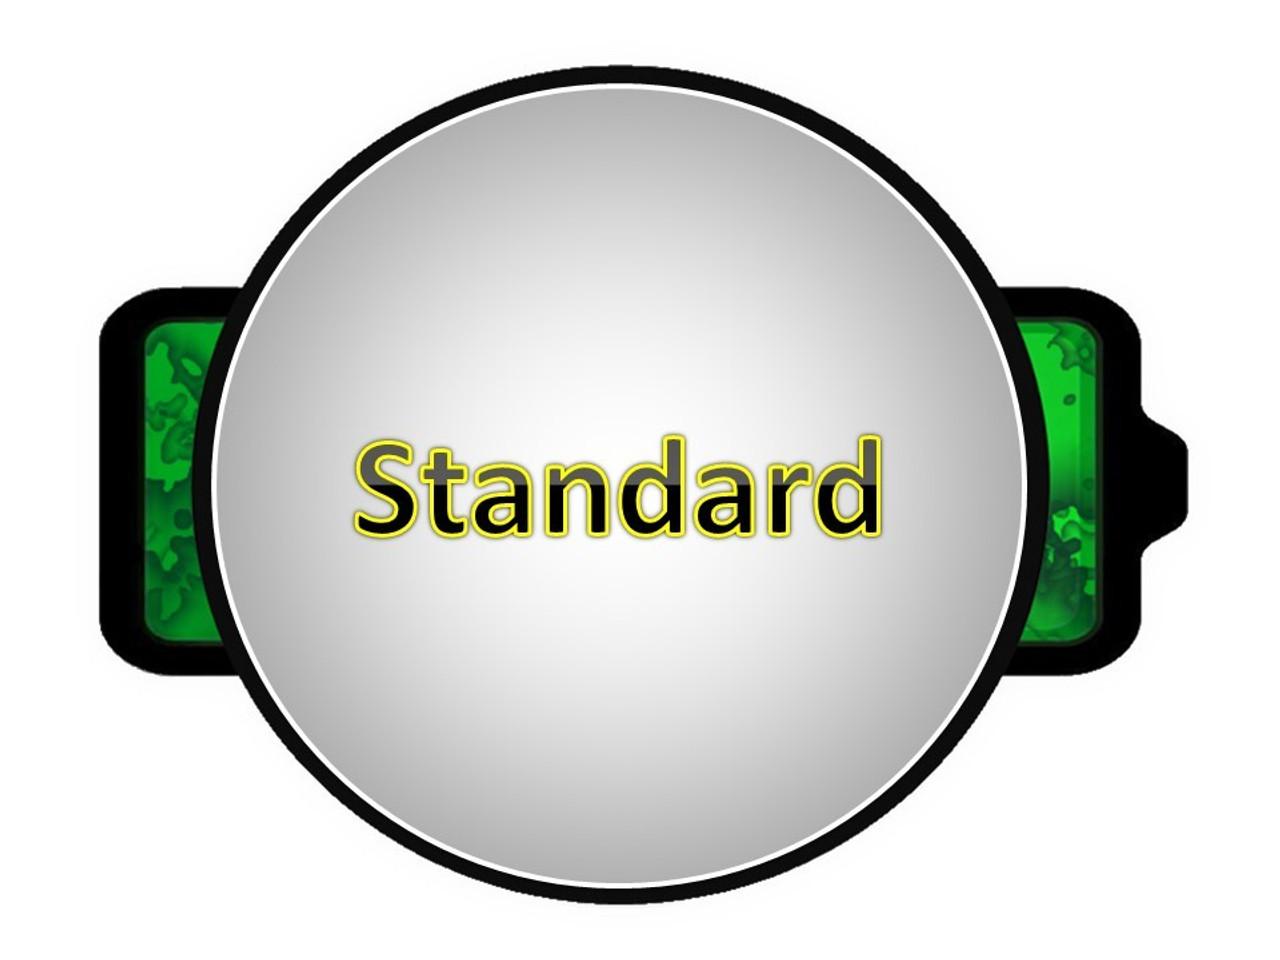 12V RIDGID Standard